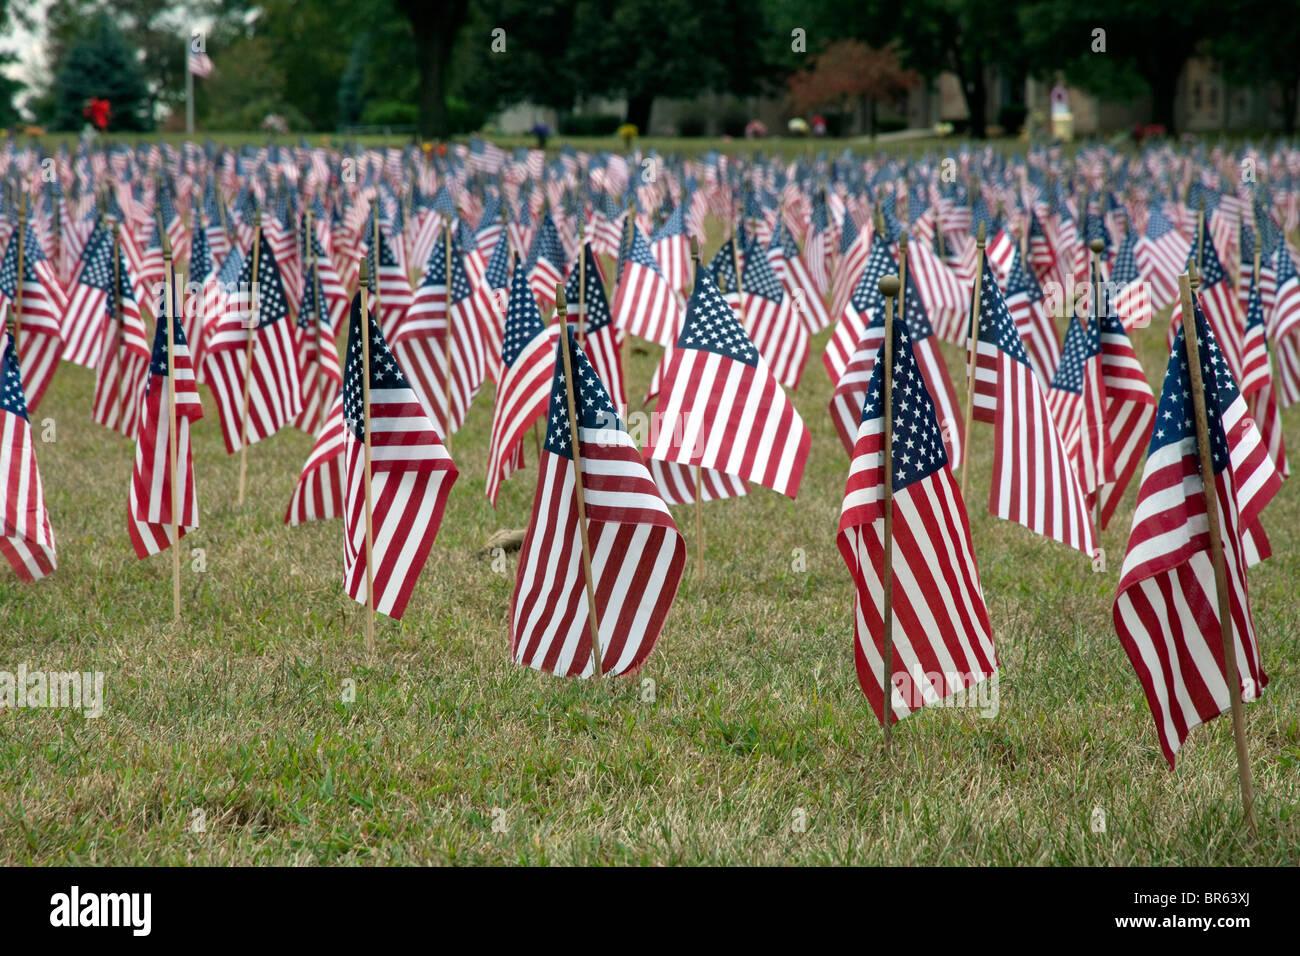 9-11 Flag Commemoration Michigan USA - Stock Image